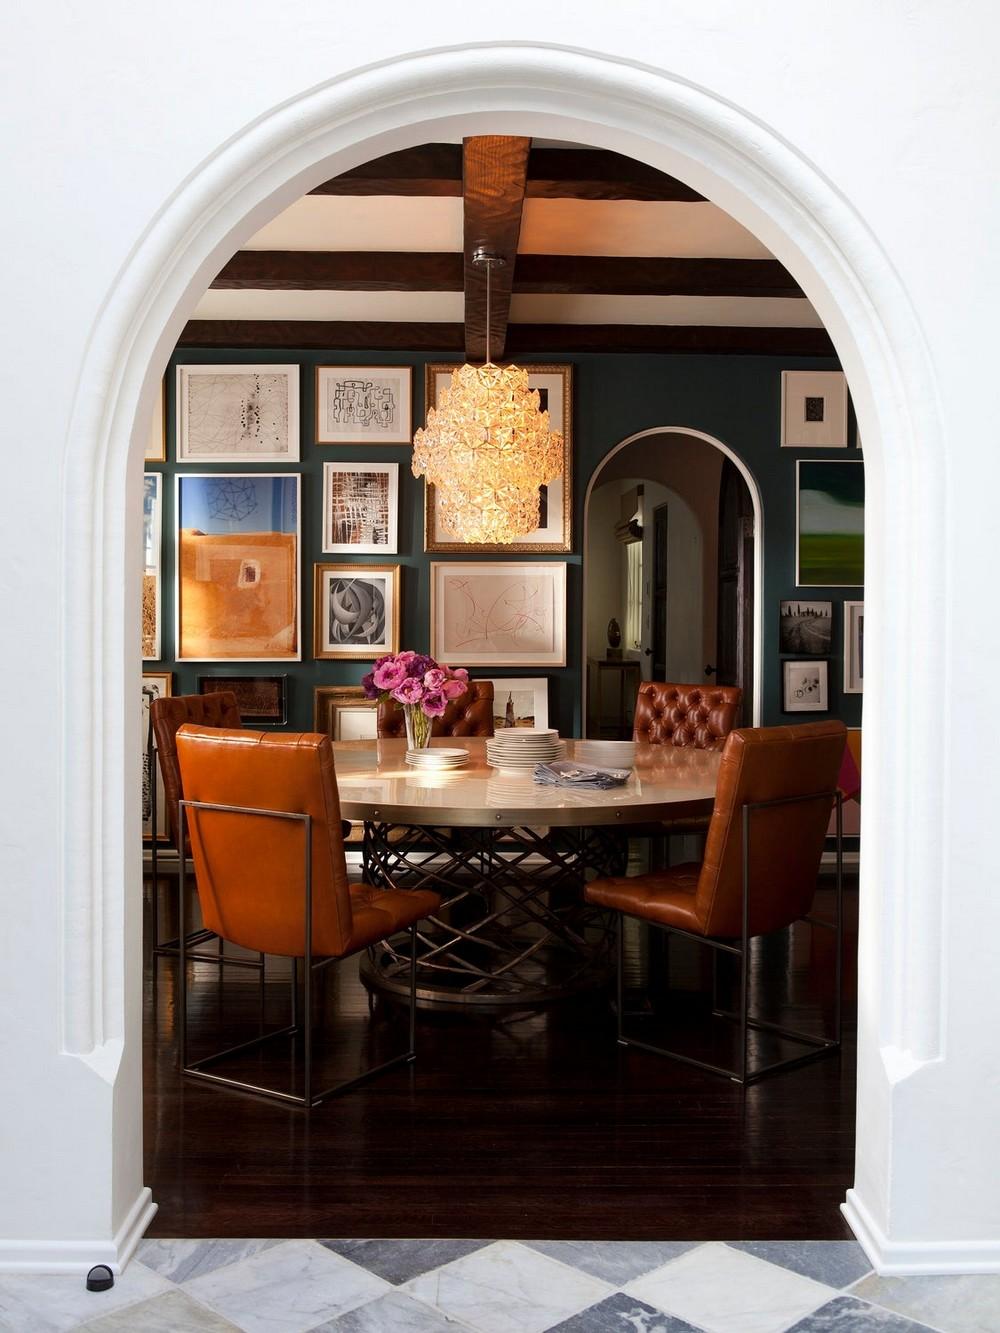 nate berkus Dining Room Projects by Nate Berkus 3 1stDibs